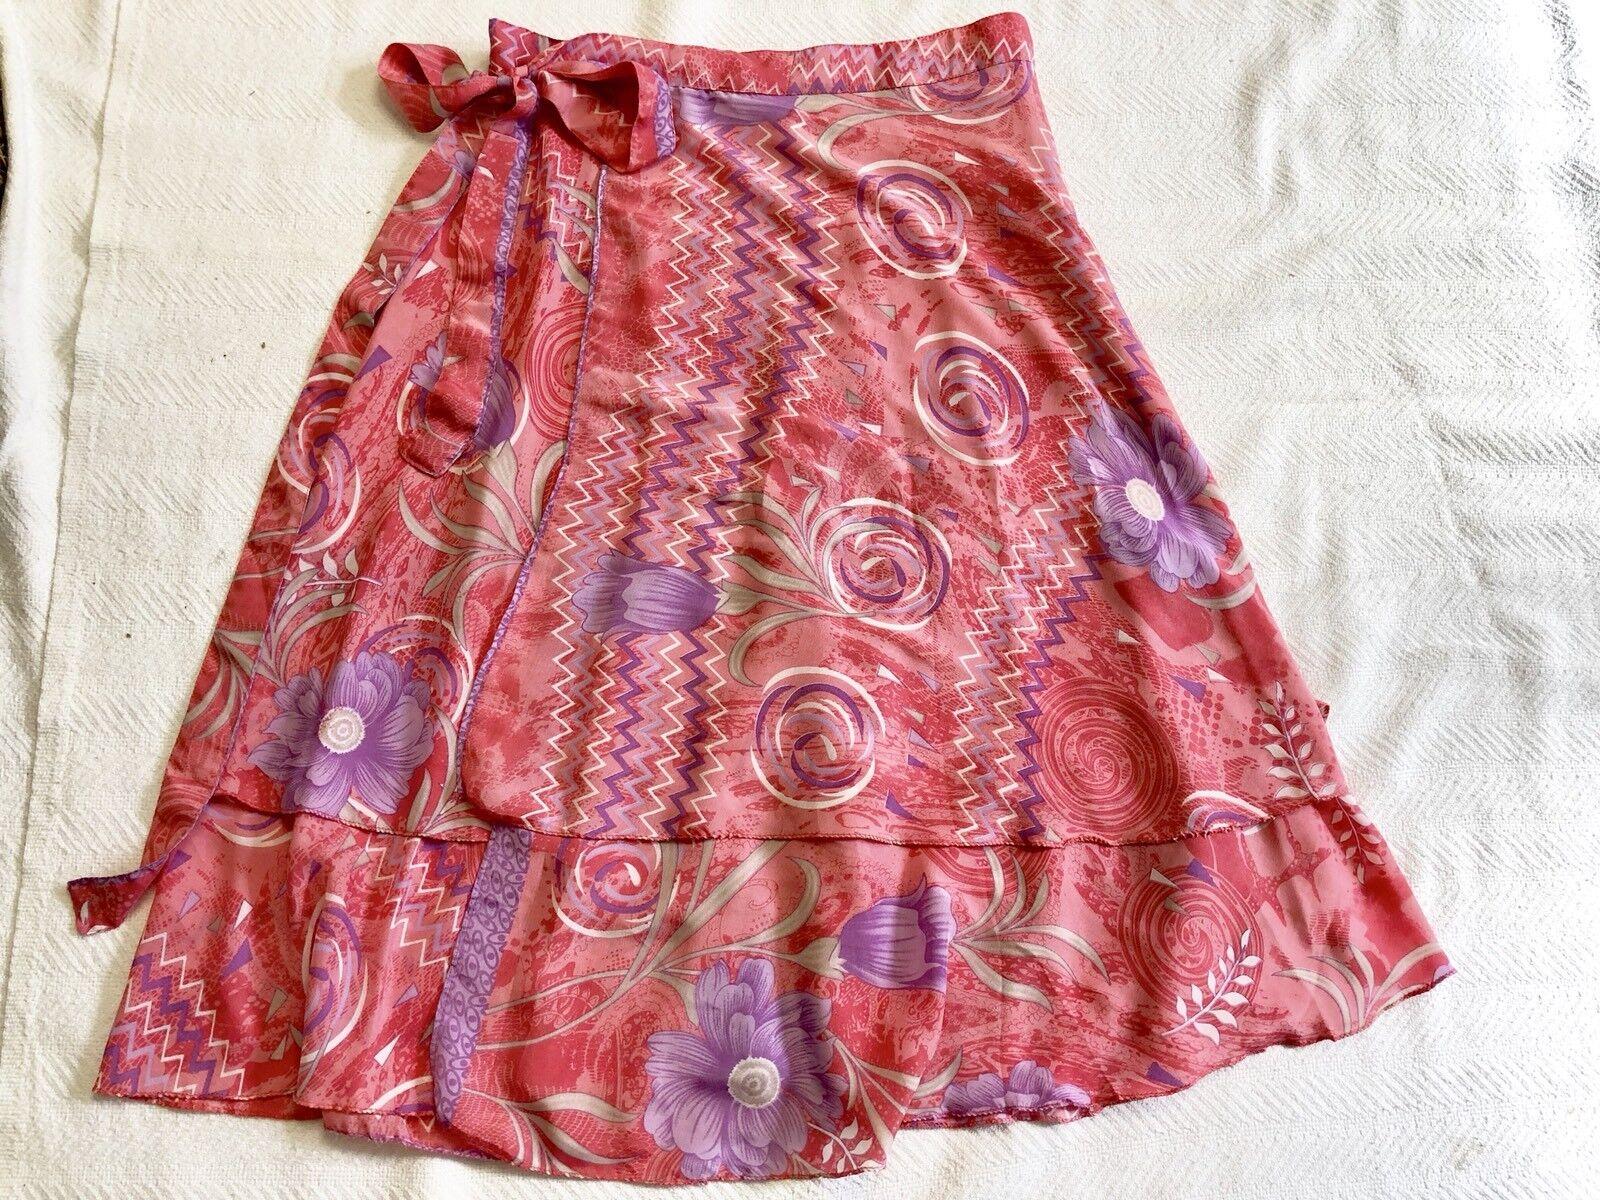 Ladies Coral Pink And Lavender Hawaiian Print Silk Blend Wrap Skirt NWOT